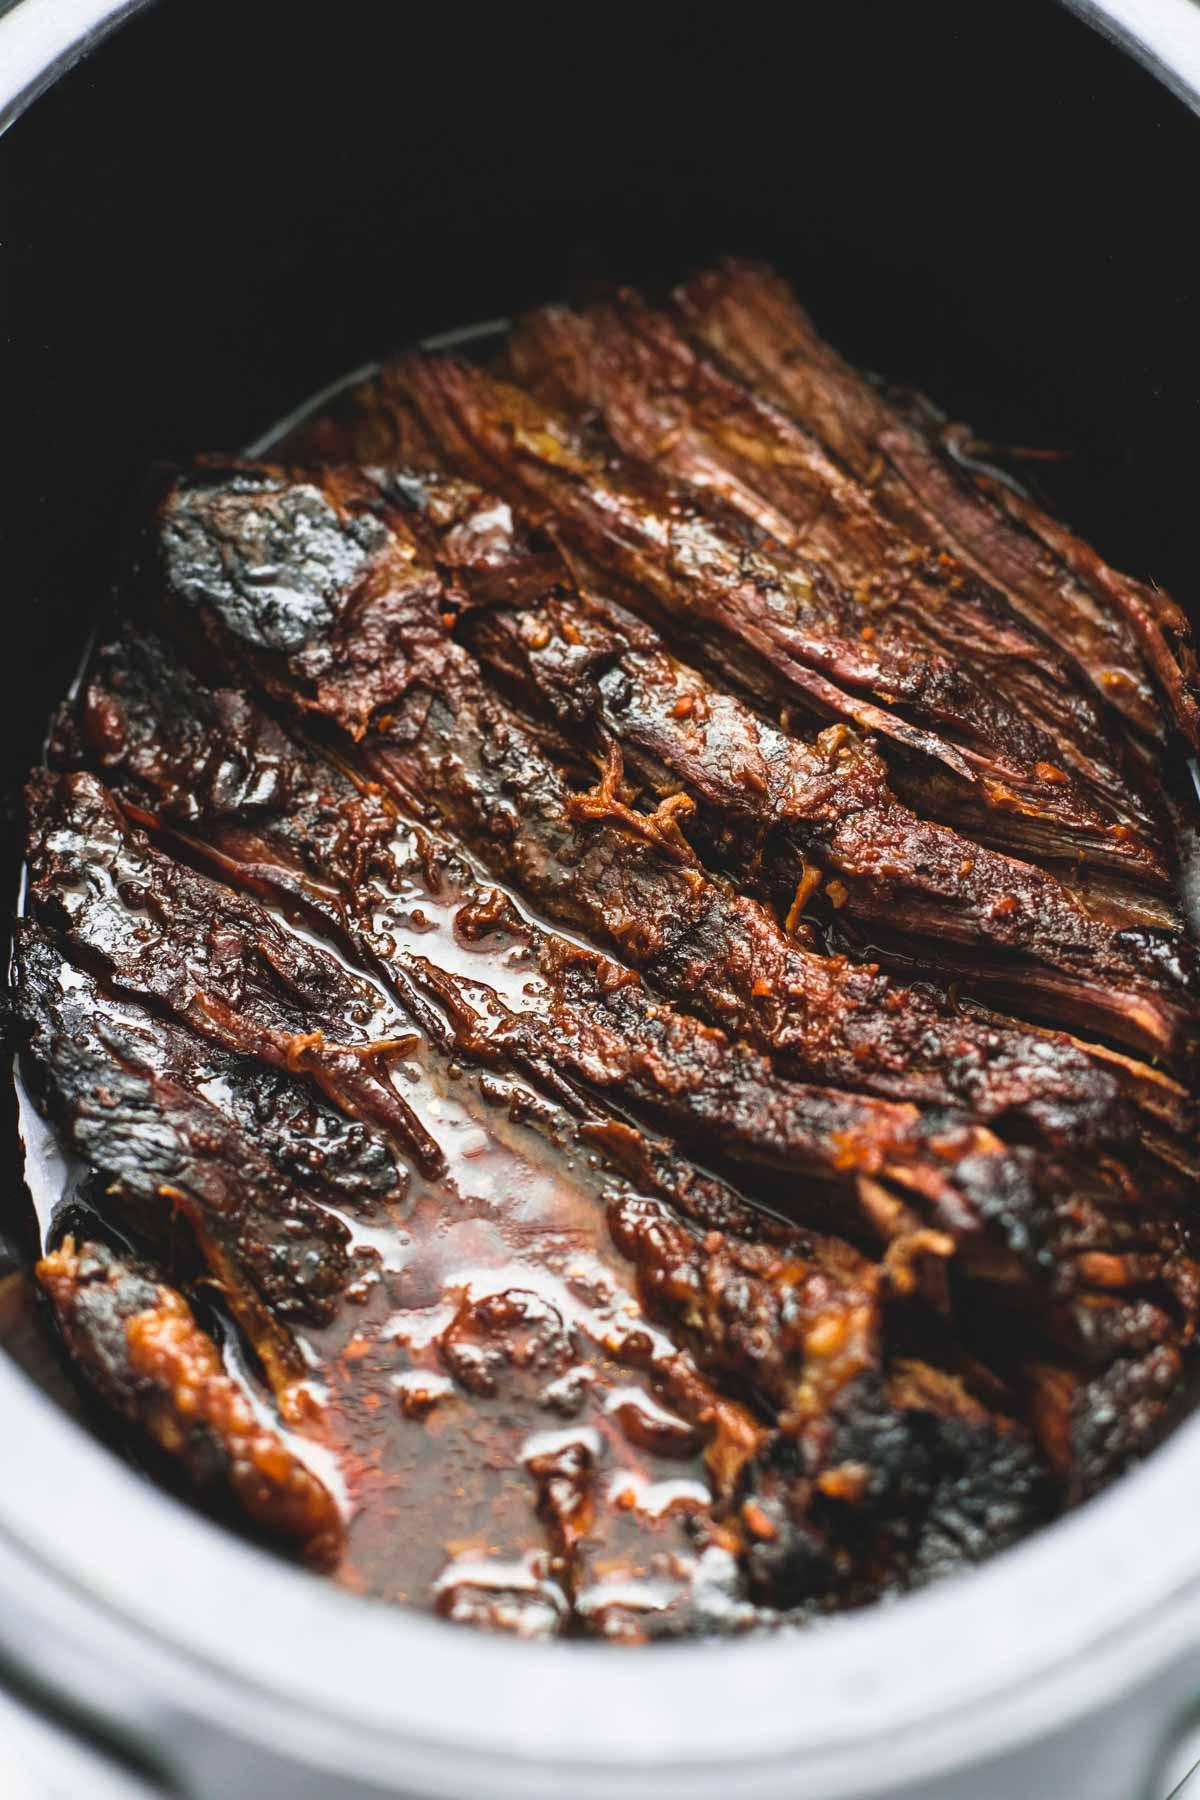 Bbq Beef Brisket Recipe  bbq corned beef brisket recipe slow cooker